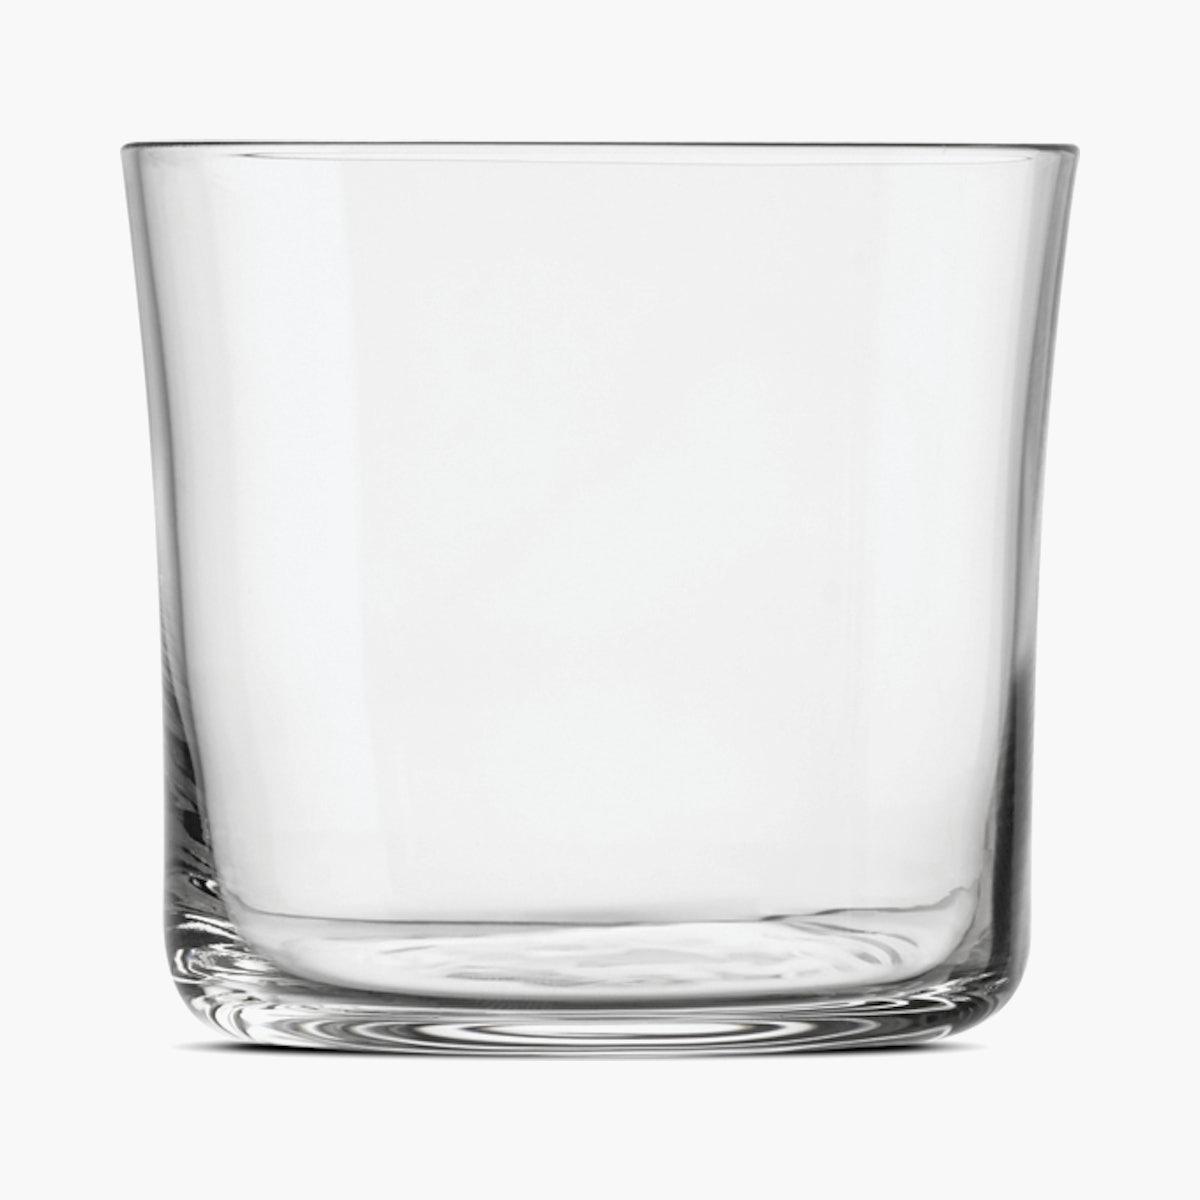 Savage Glassware - Set of 4